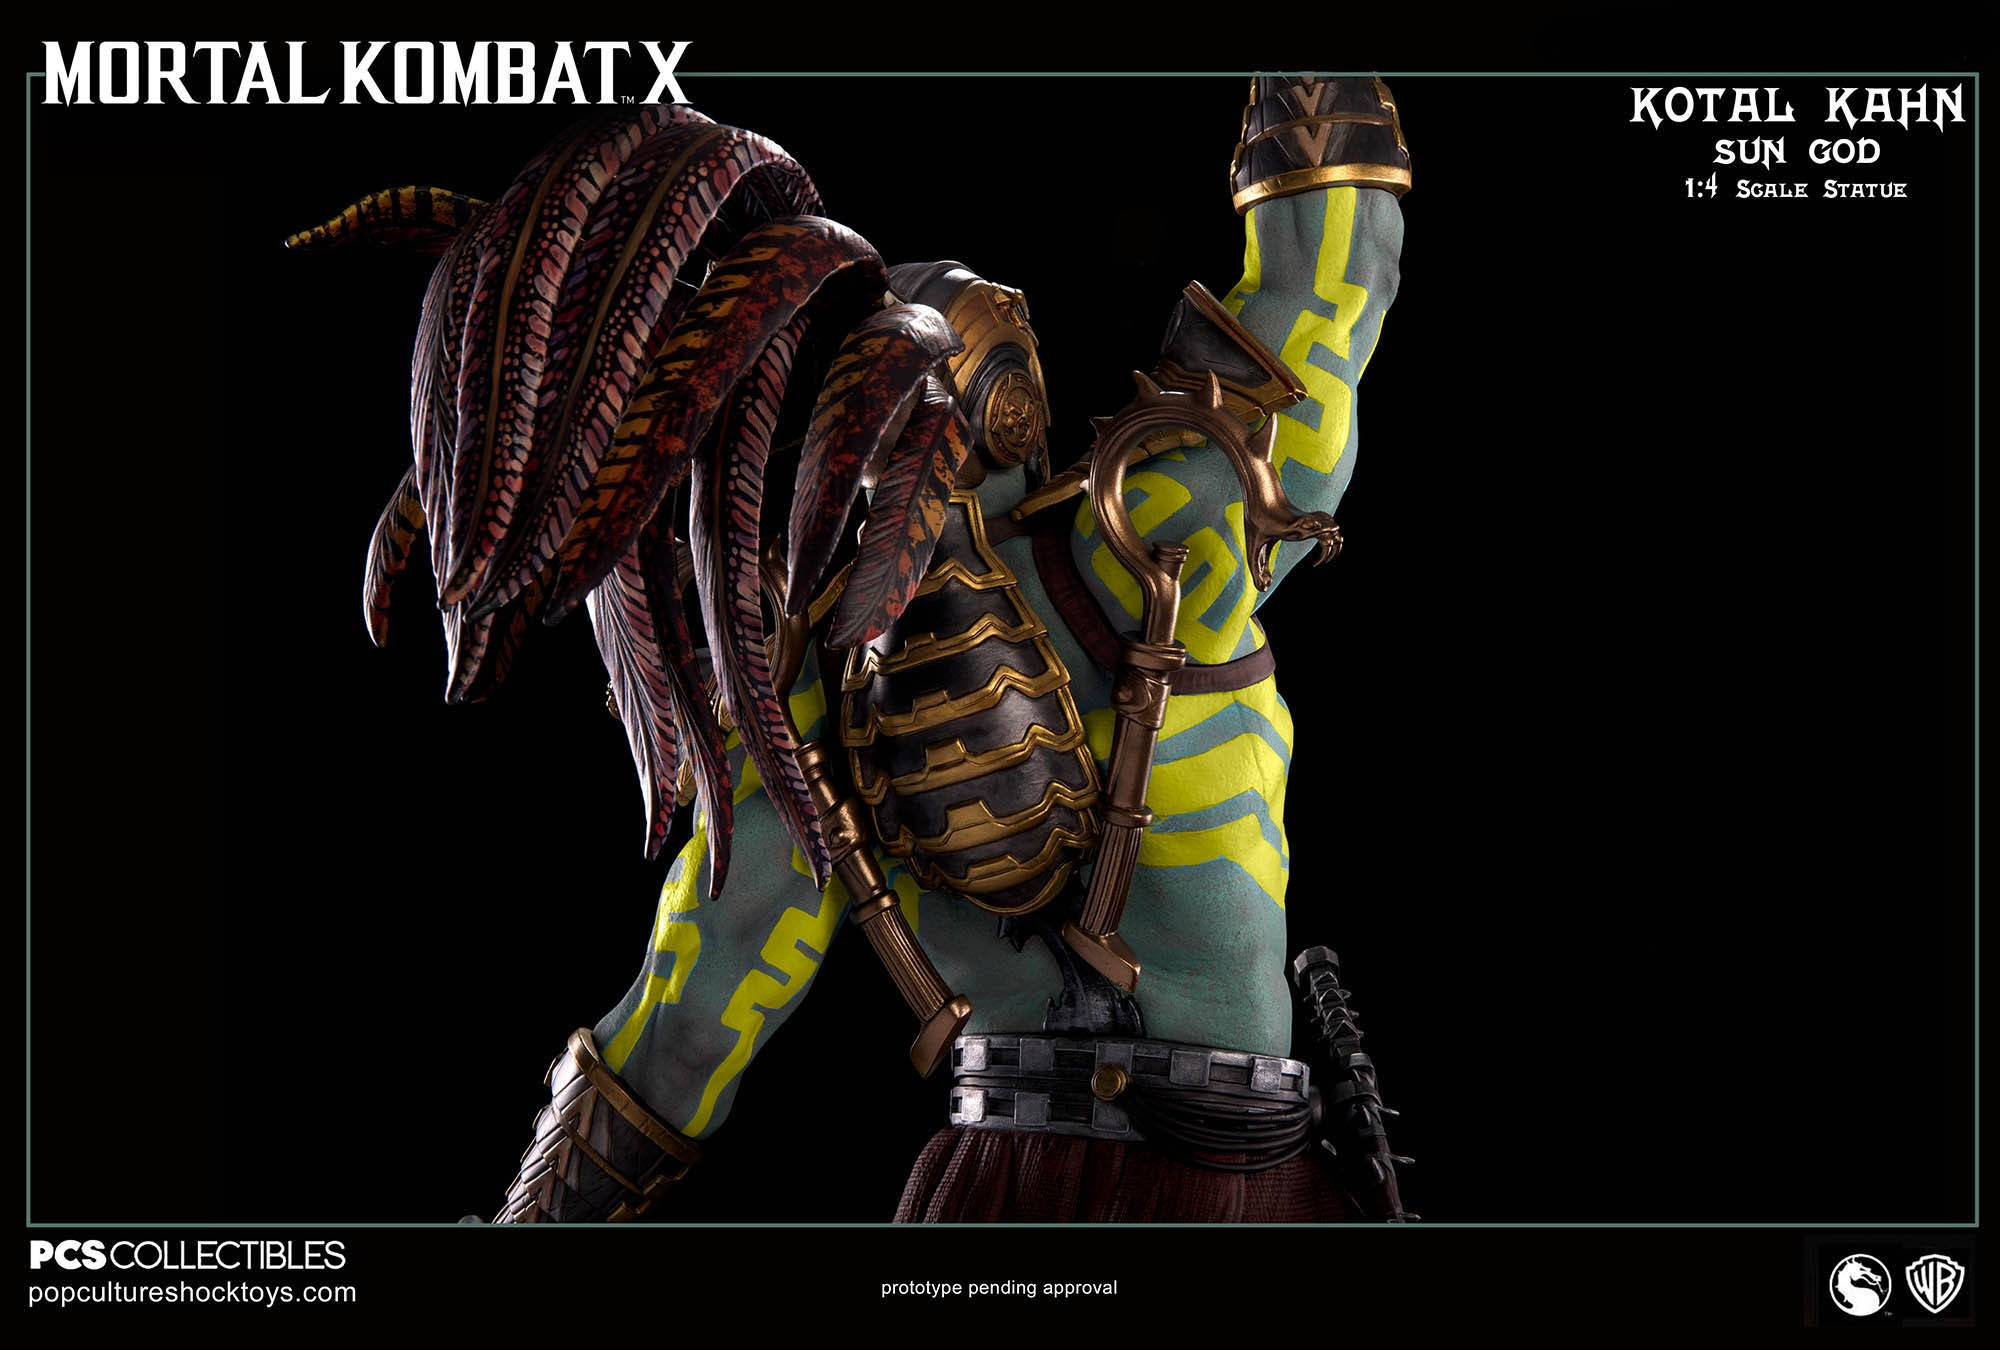 [Pop Culture Shock] Mortal Kombat X: Kotal Kahn 1:4 scale PCS-Kotal-Kahn-Sun-God-023